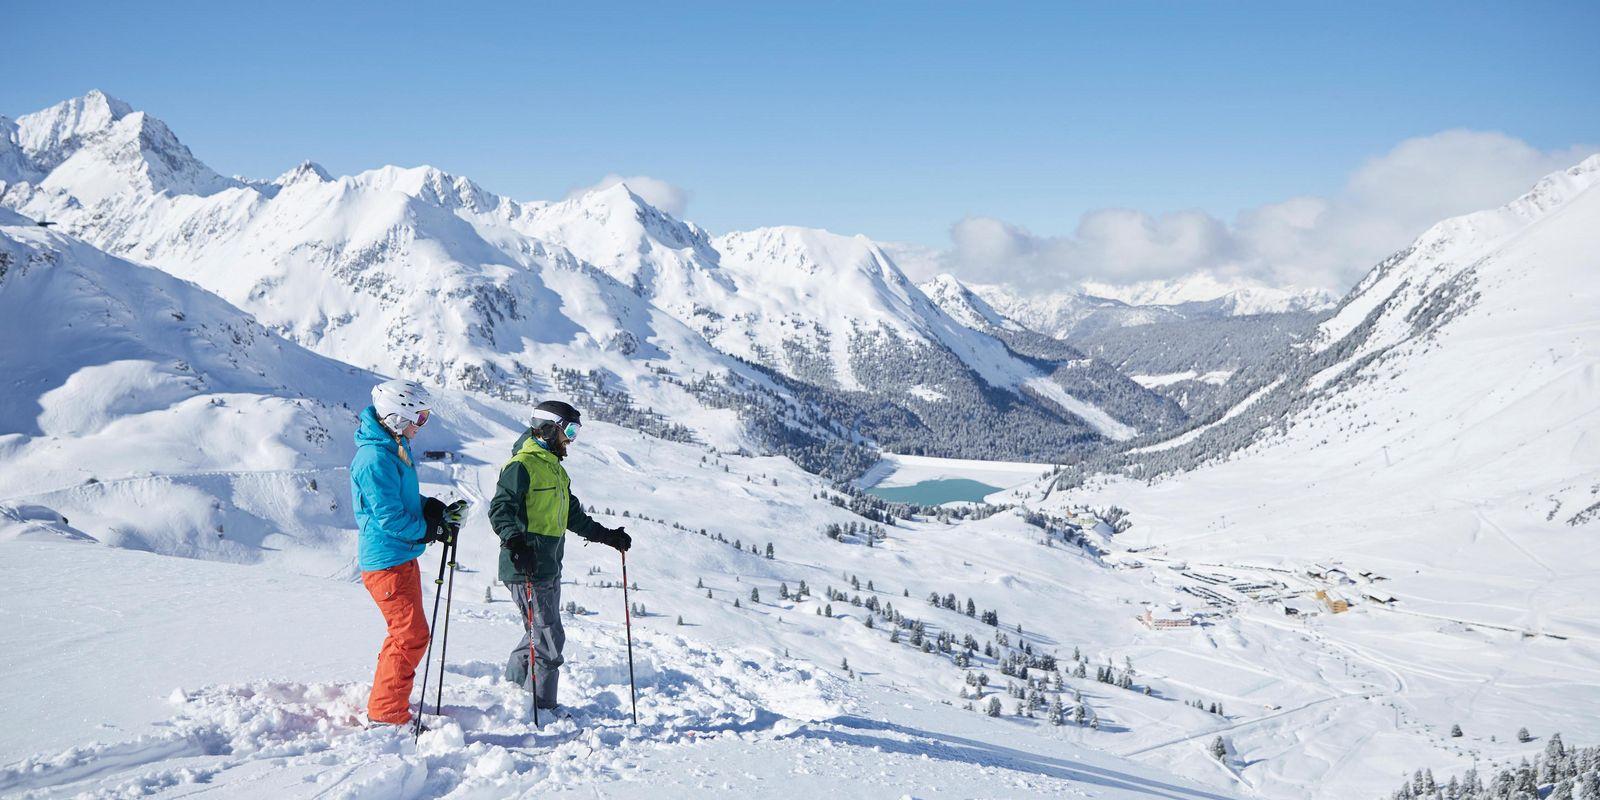 Skiing | © Innsbruck Tourismus / Christian Vorhofer